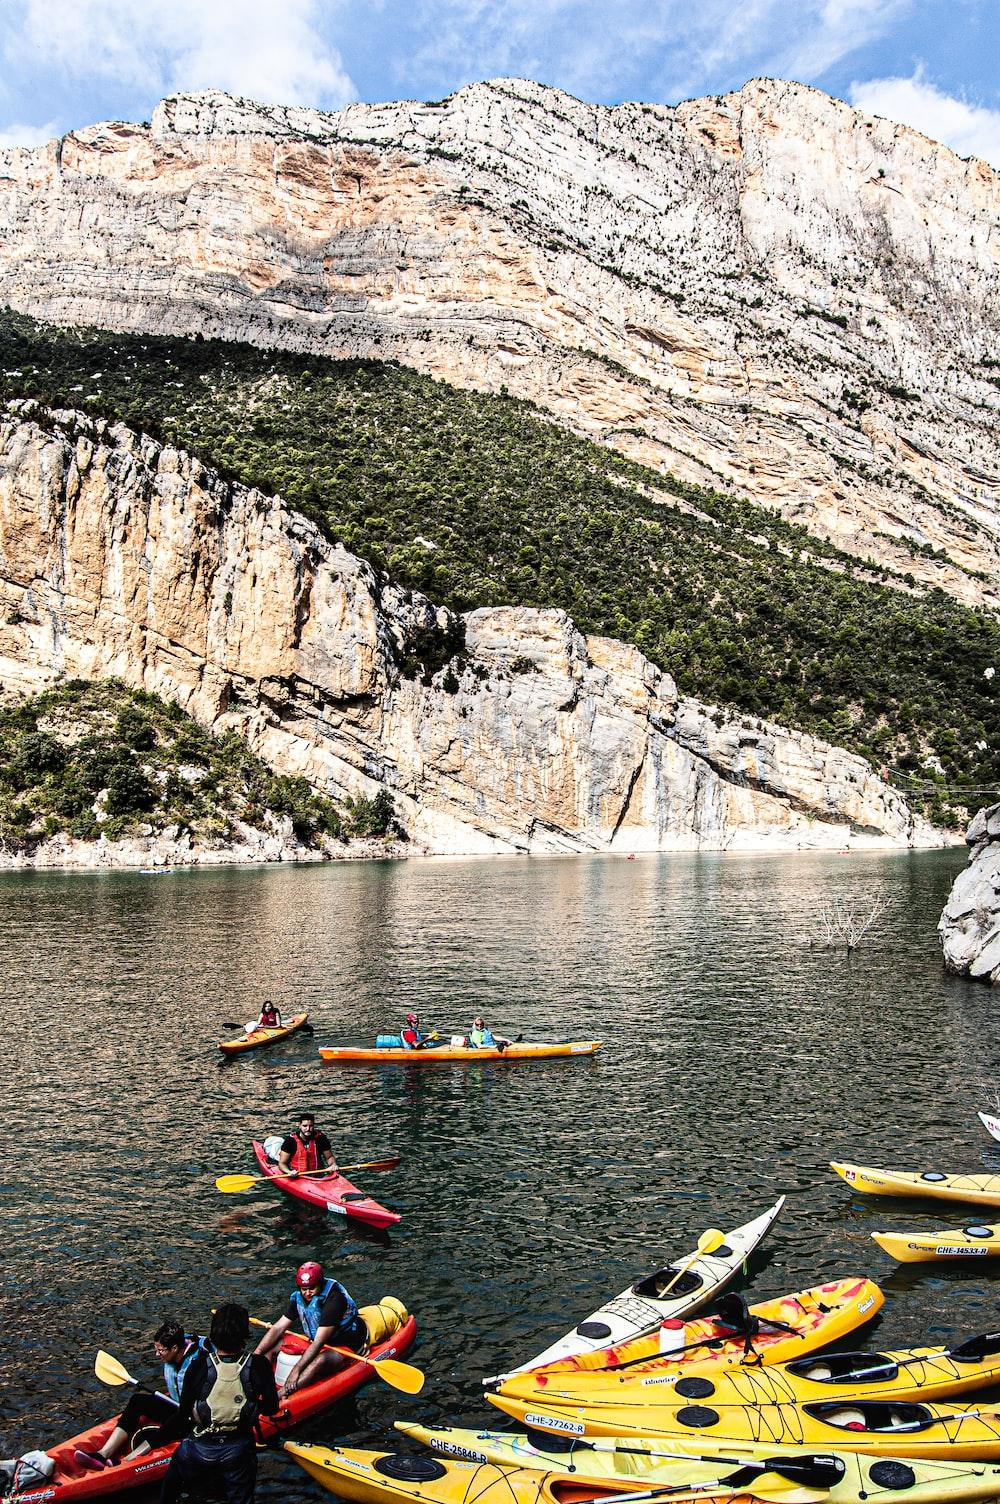 person riding on kayak on river during daytime